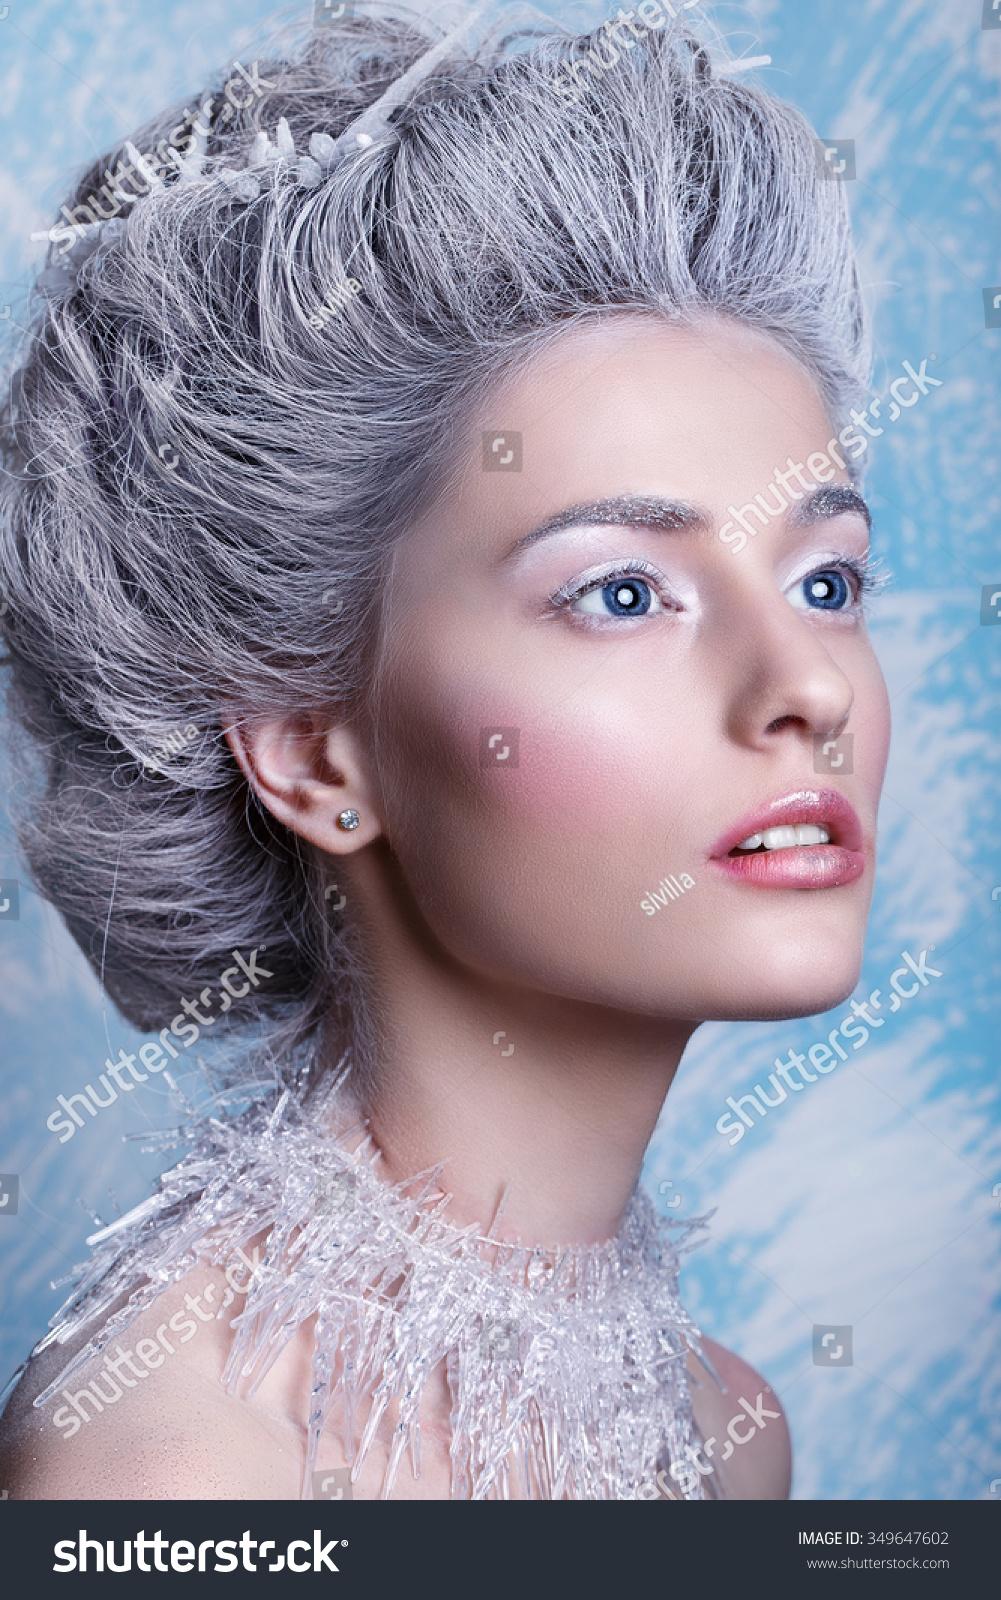 Winter Beauty Woman Christmas Girl Makeup Winter Stock Photo Edit